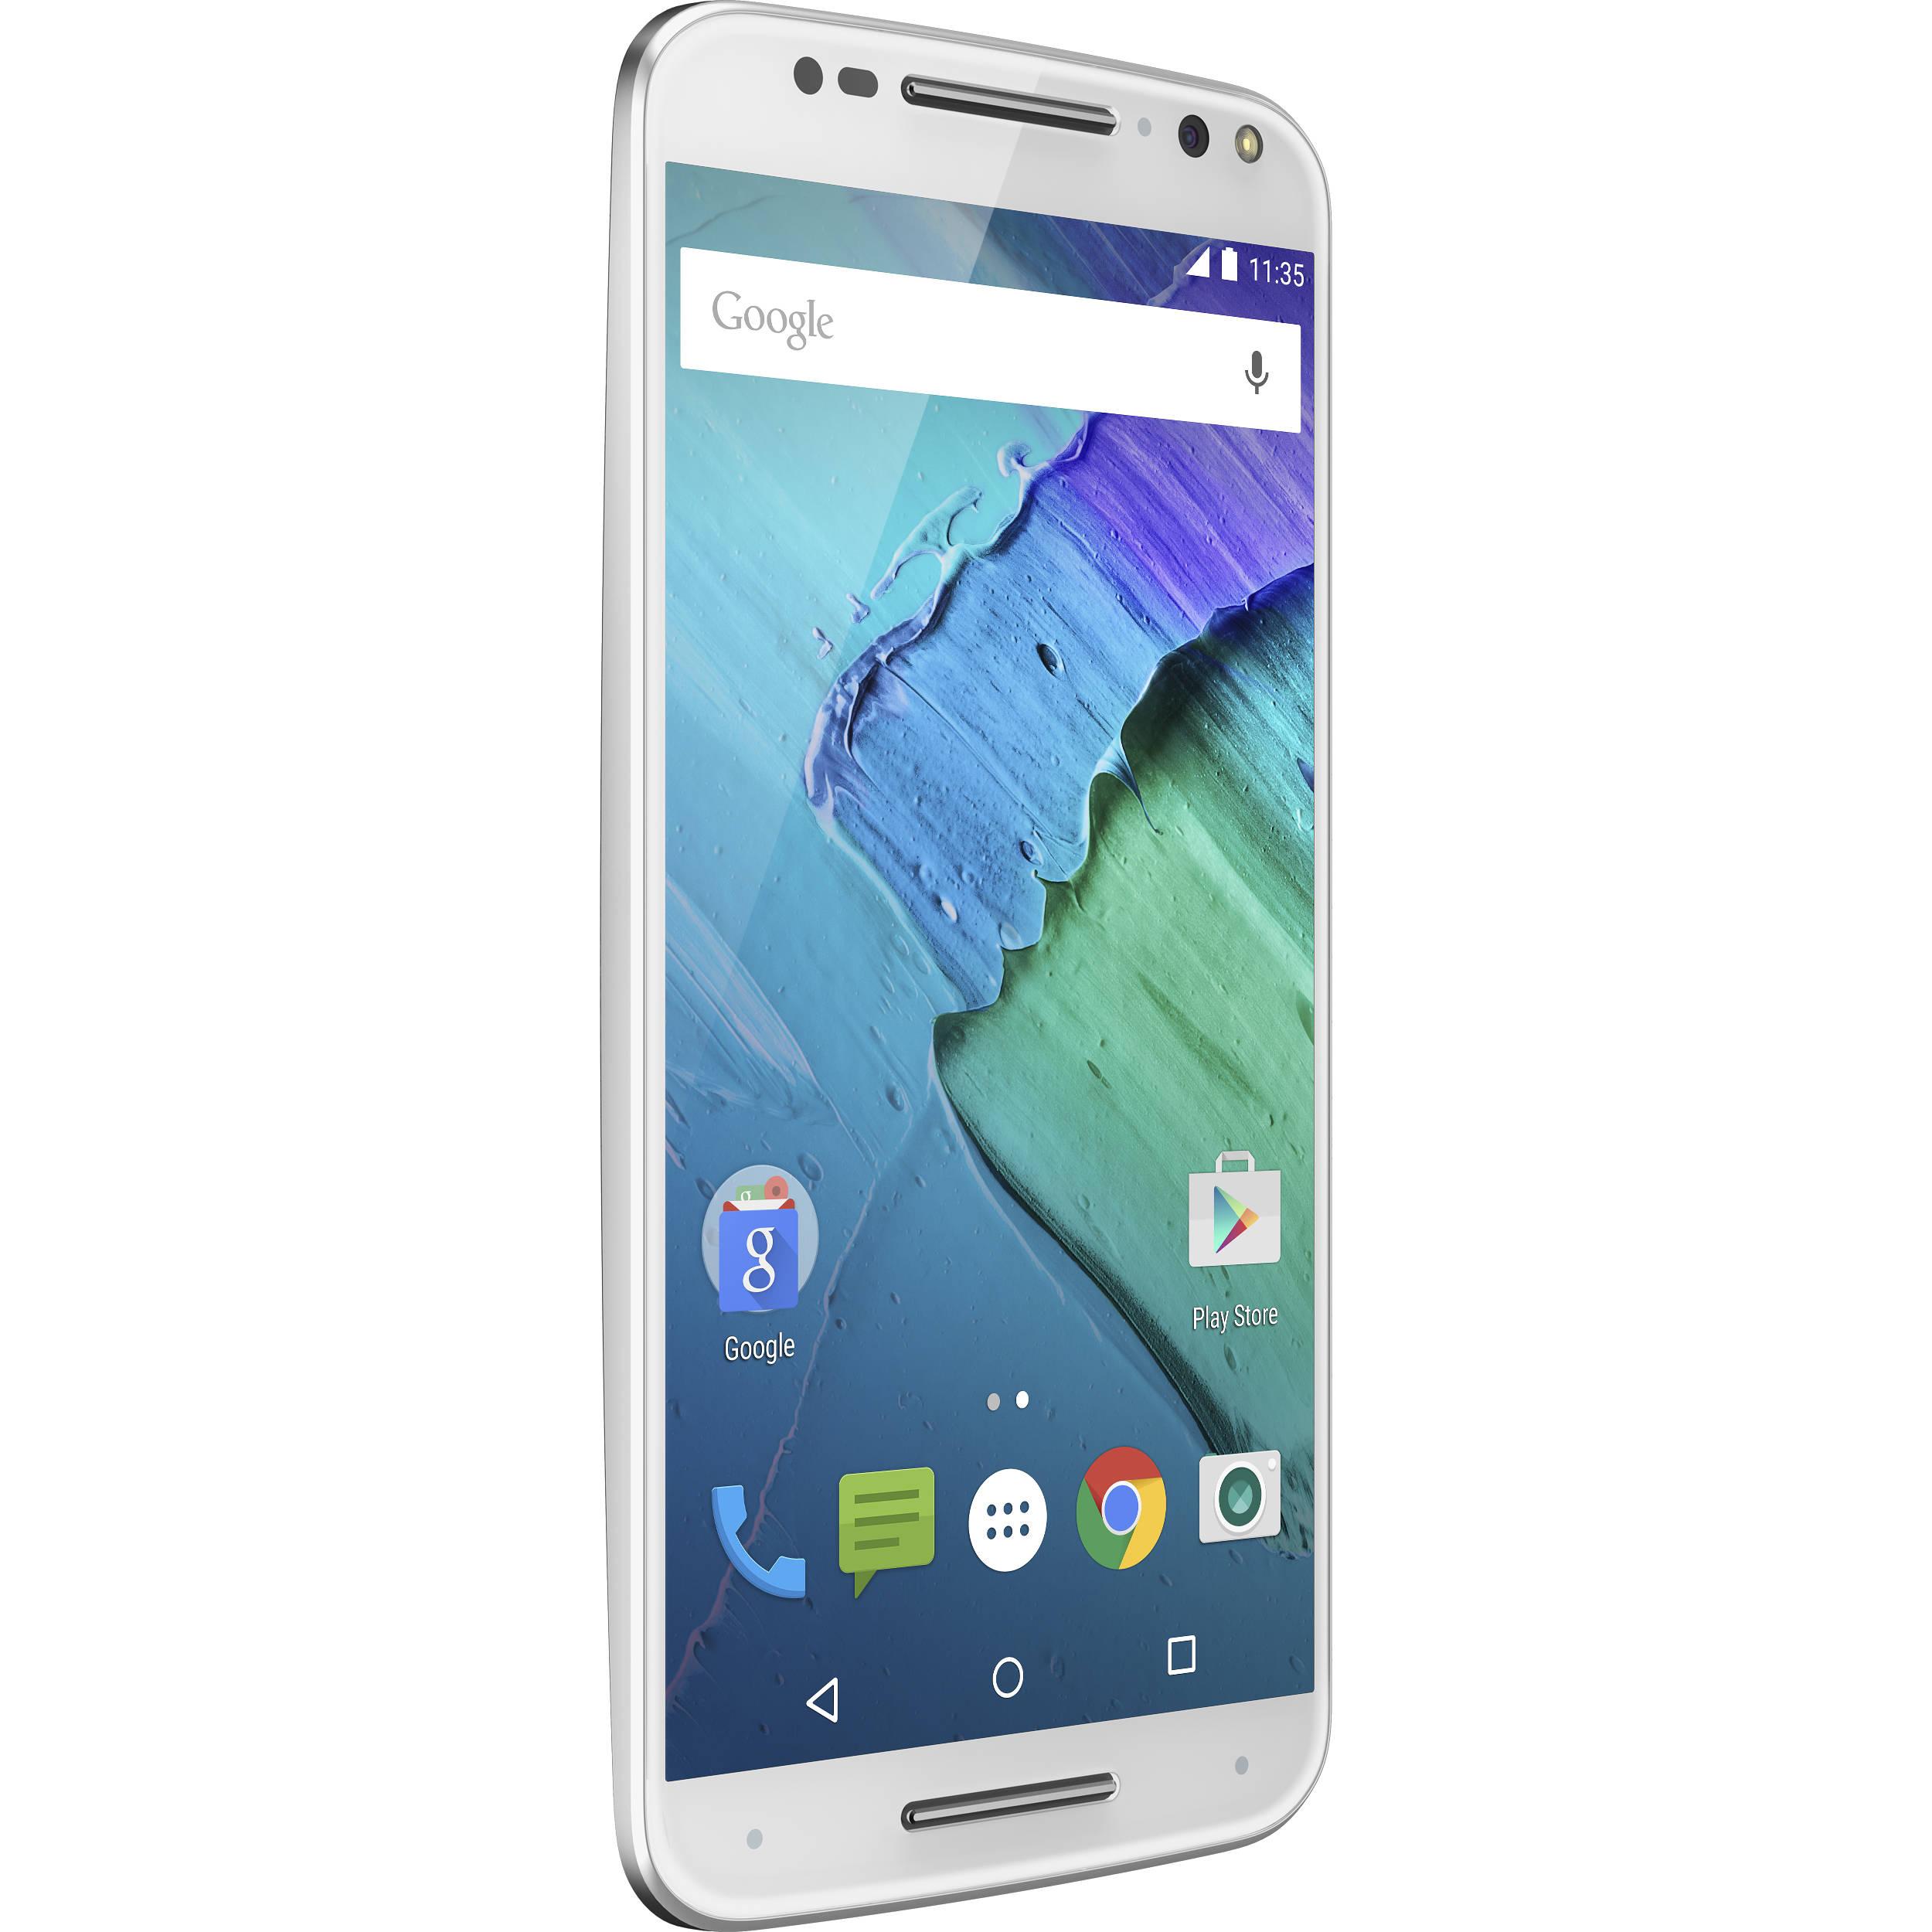 buy popular 20a76 a8cc0 Moto X Pure Edition 64GB Smartphone (Unlocked, White/Bamboo)